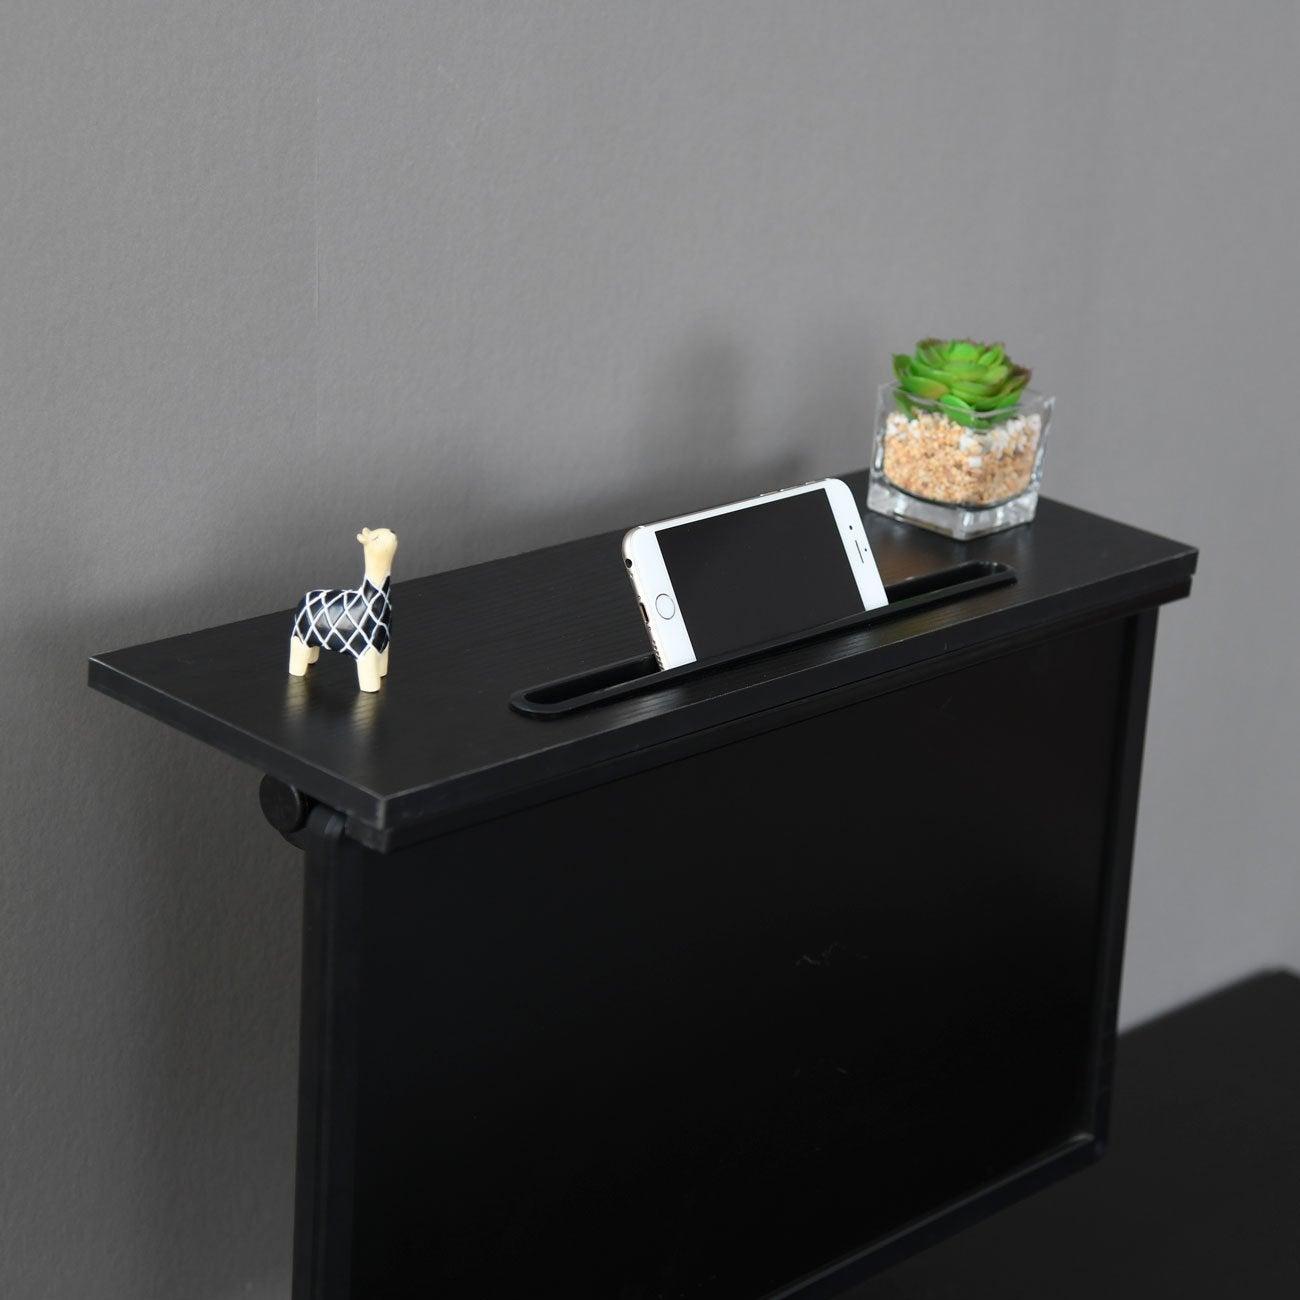 ZASS Mountable Monitor/TV/Screen Top Shelf Monitor Mount Organiser - Black Willow